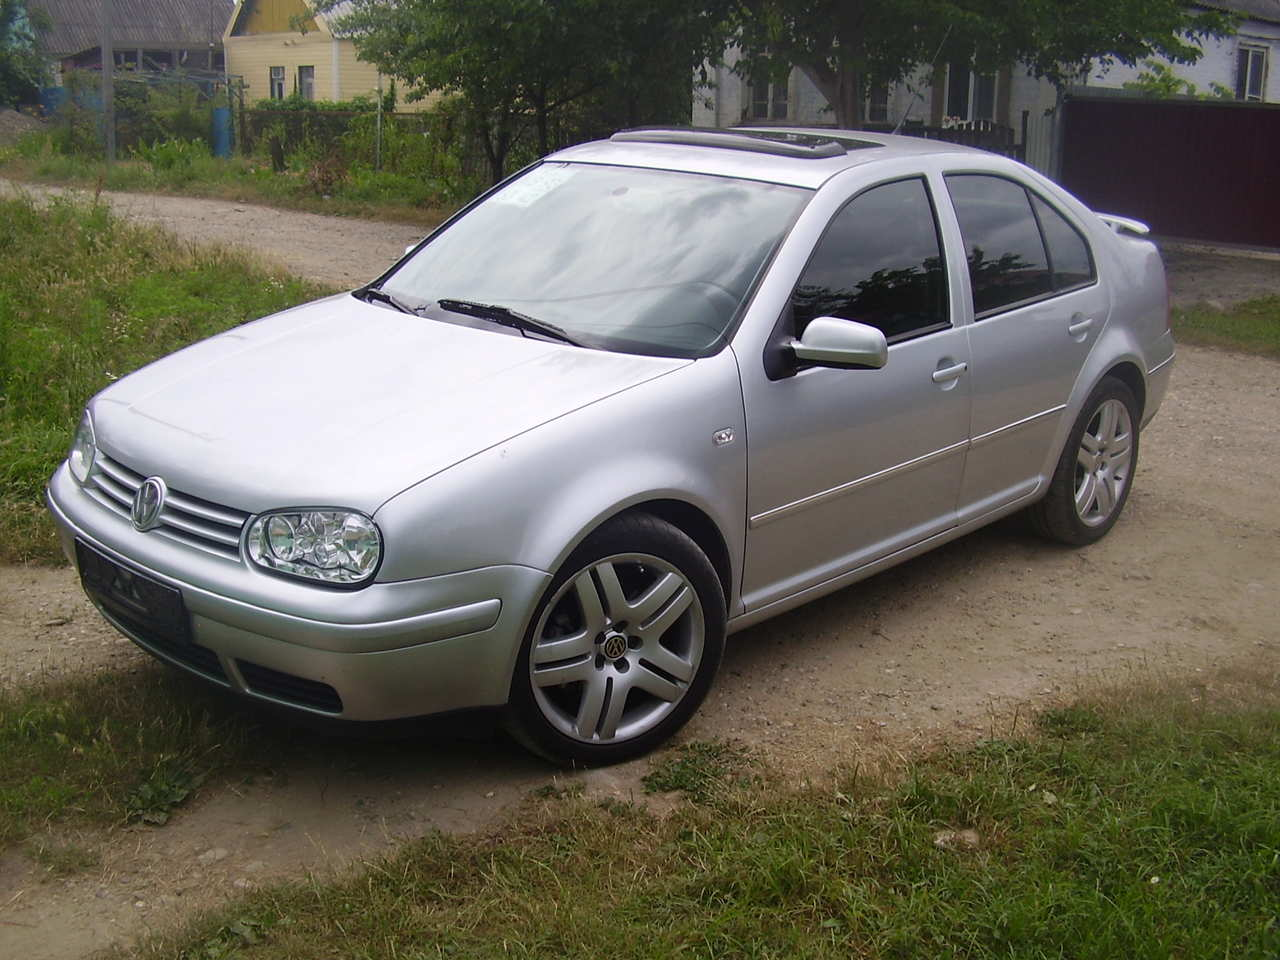 2003 Volkswagen Jetta Specs  Engine Size 1800cm3  Fuel